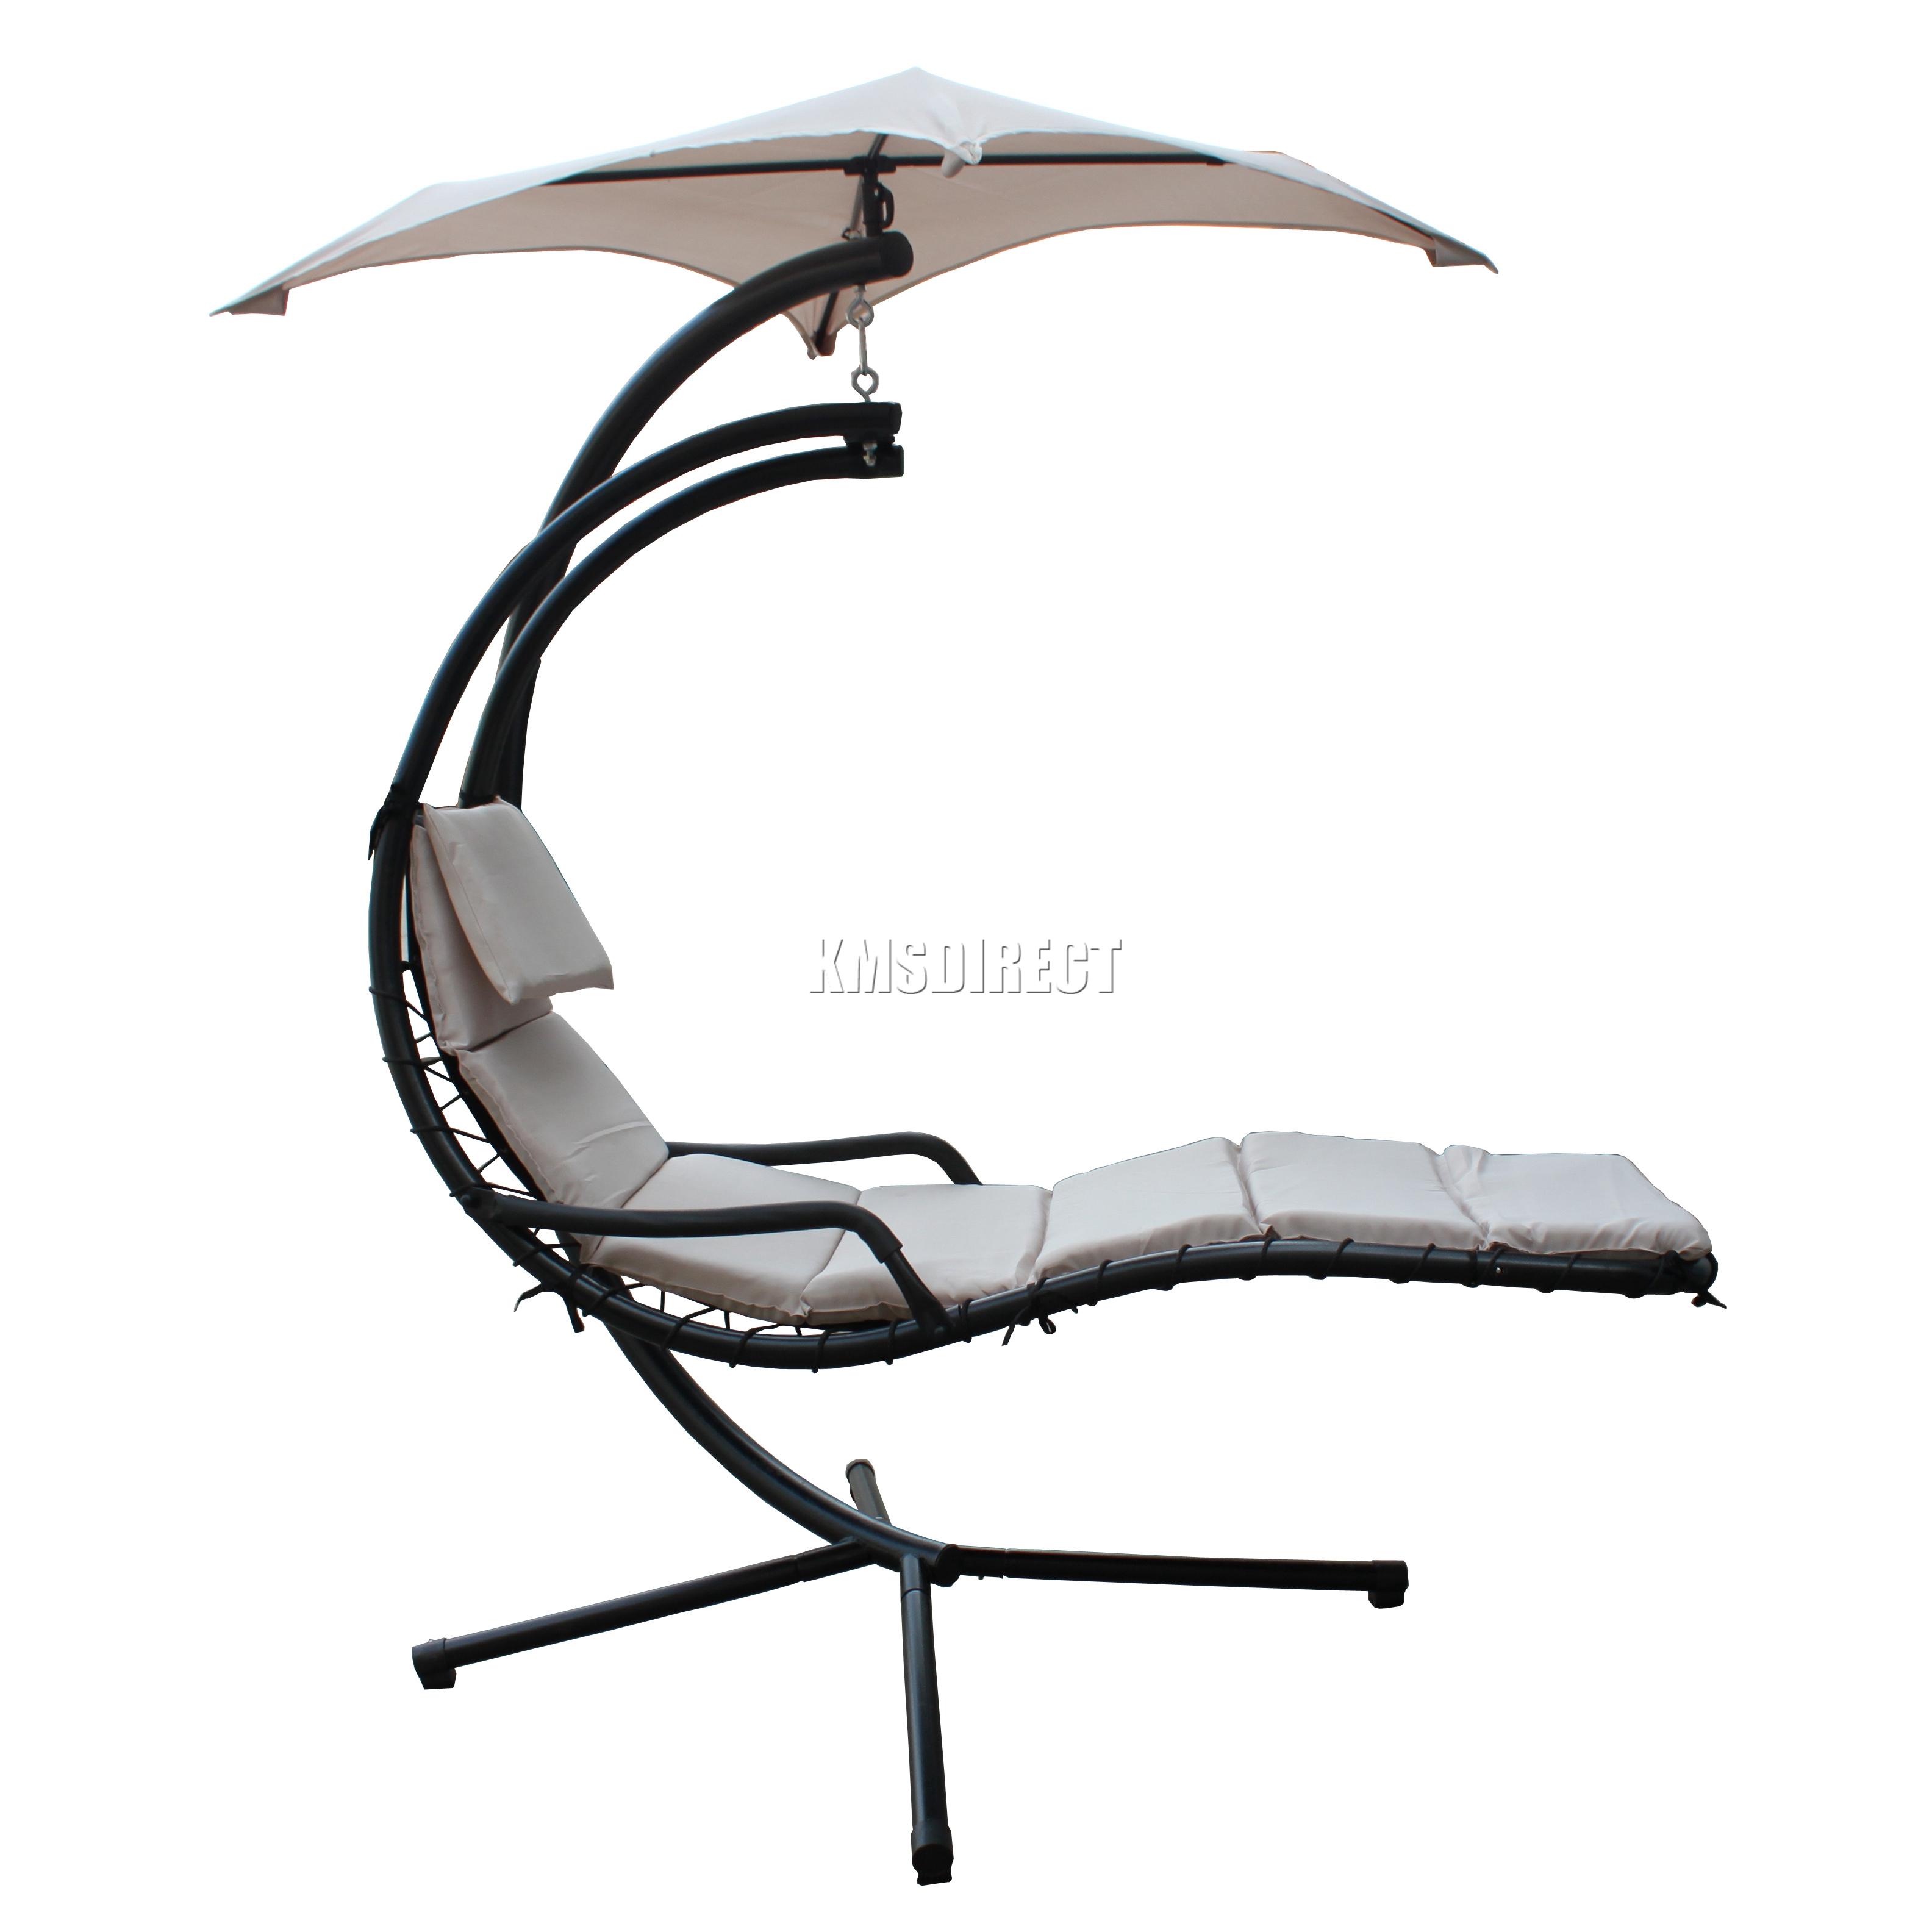 FoxHunter Garden Swing Hammock Helicopter Hanging Chair Seat Sun